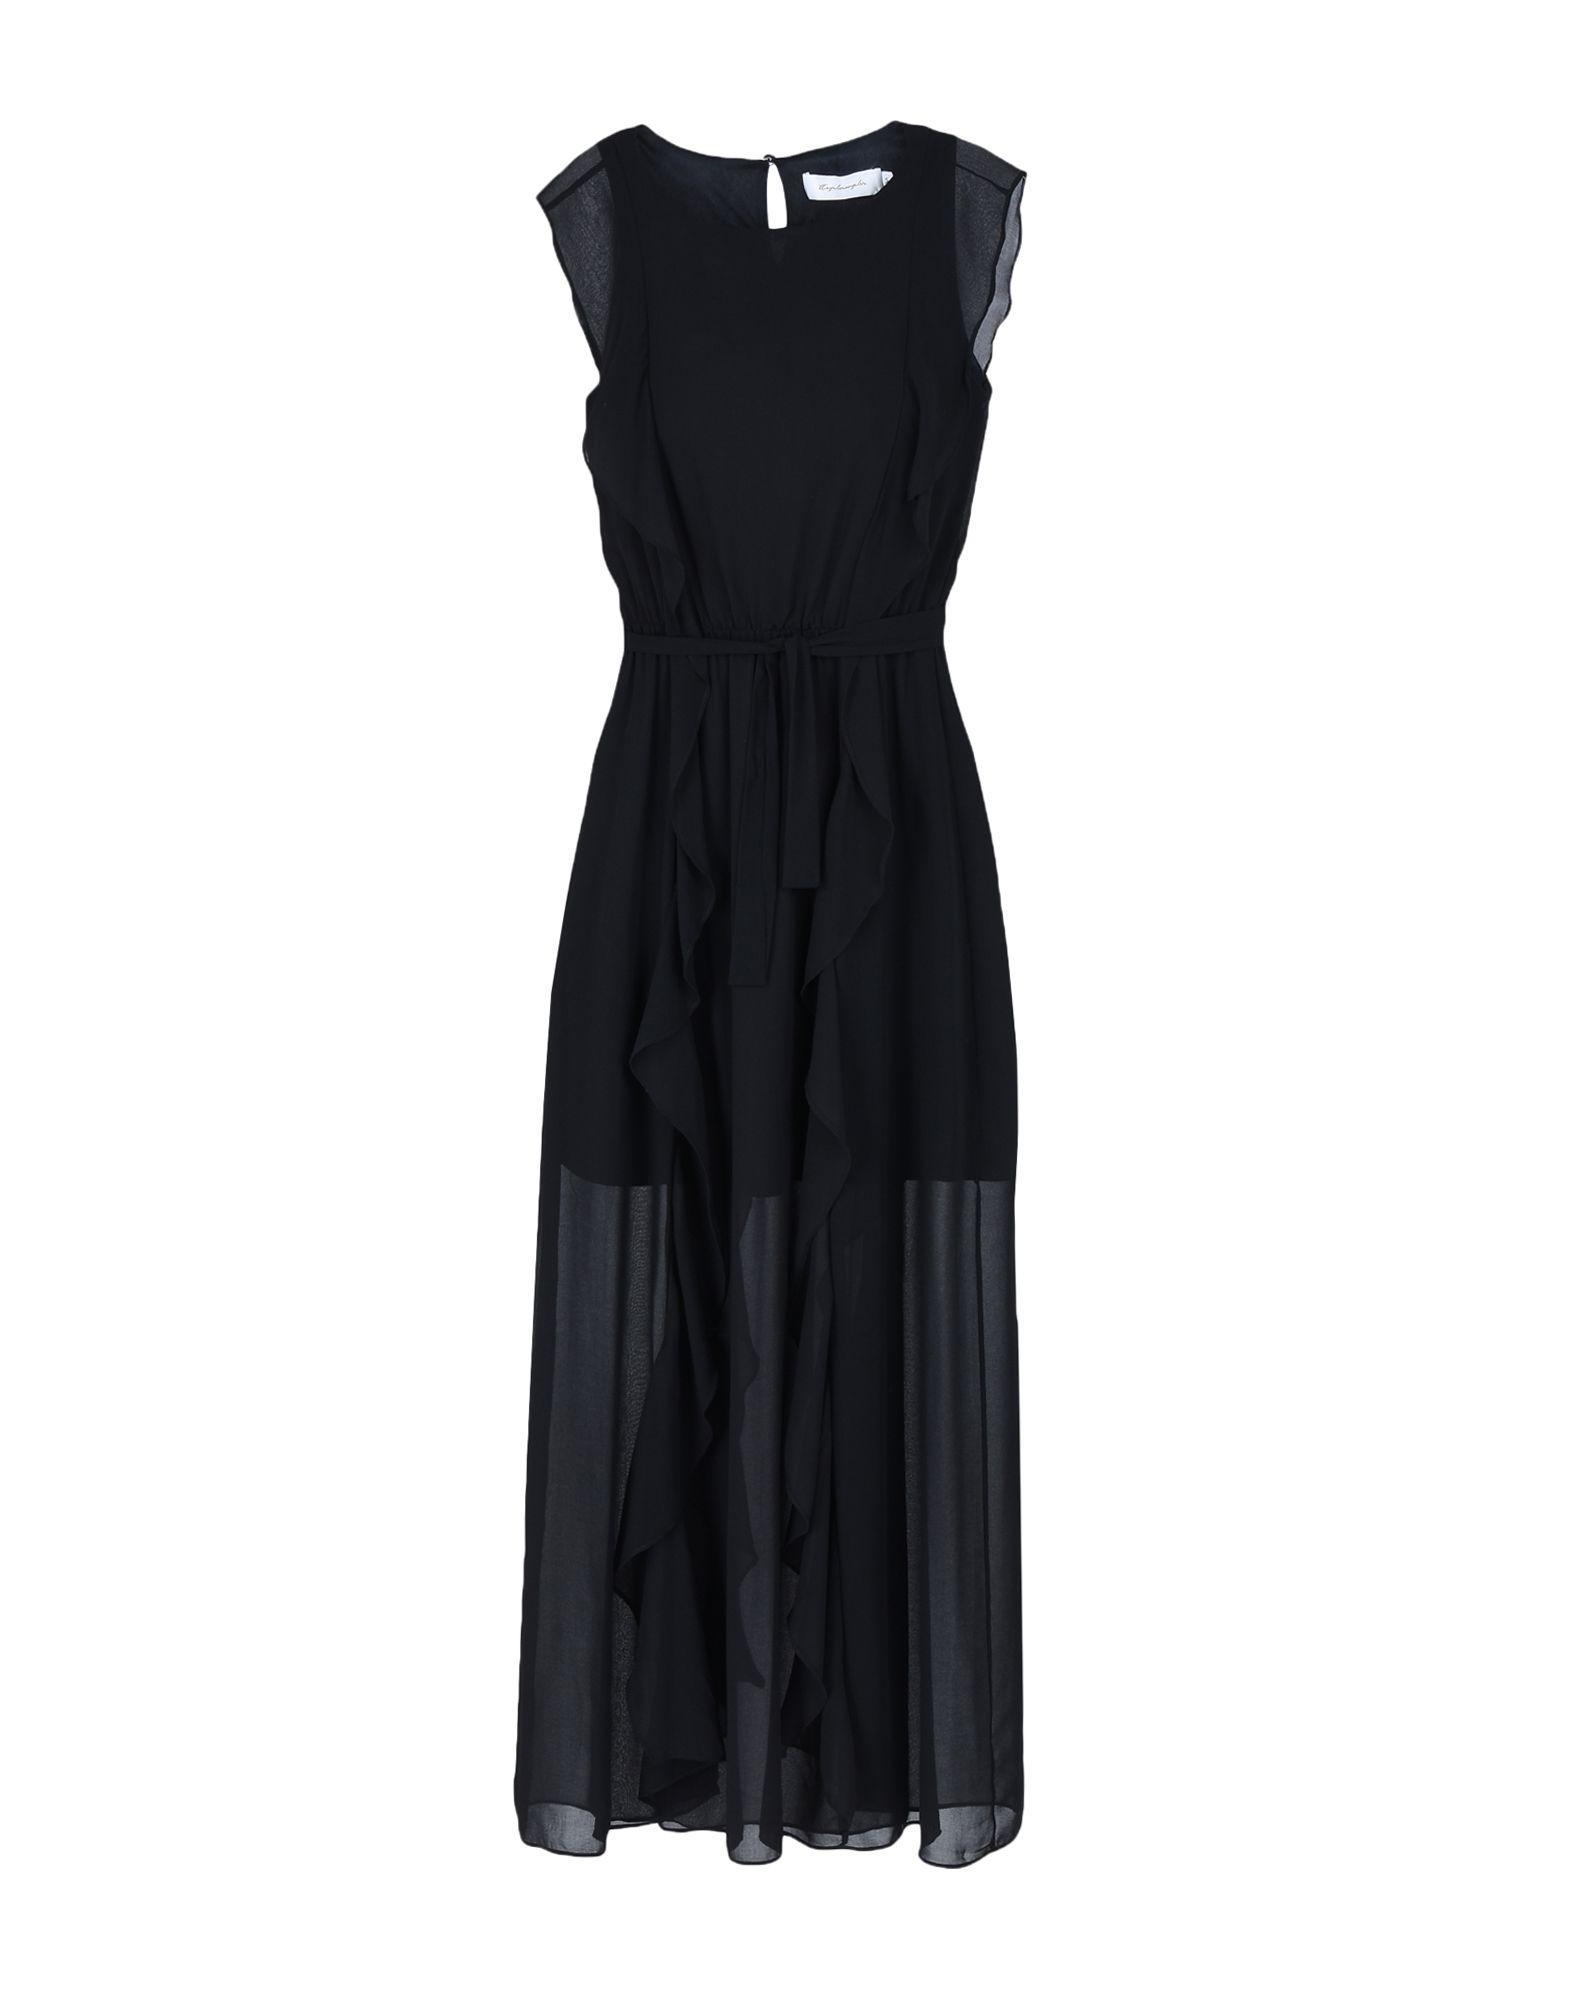 TBAGSLOSANGELES Long Dress in Black